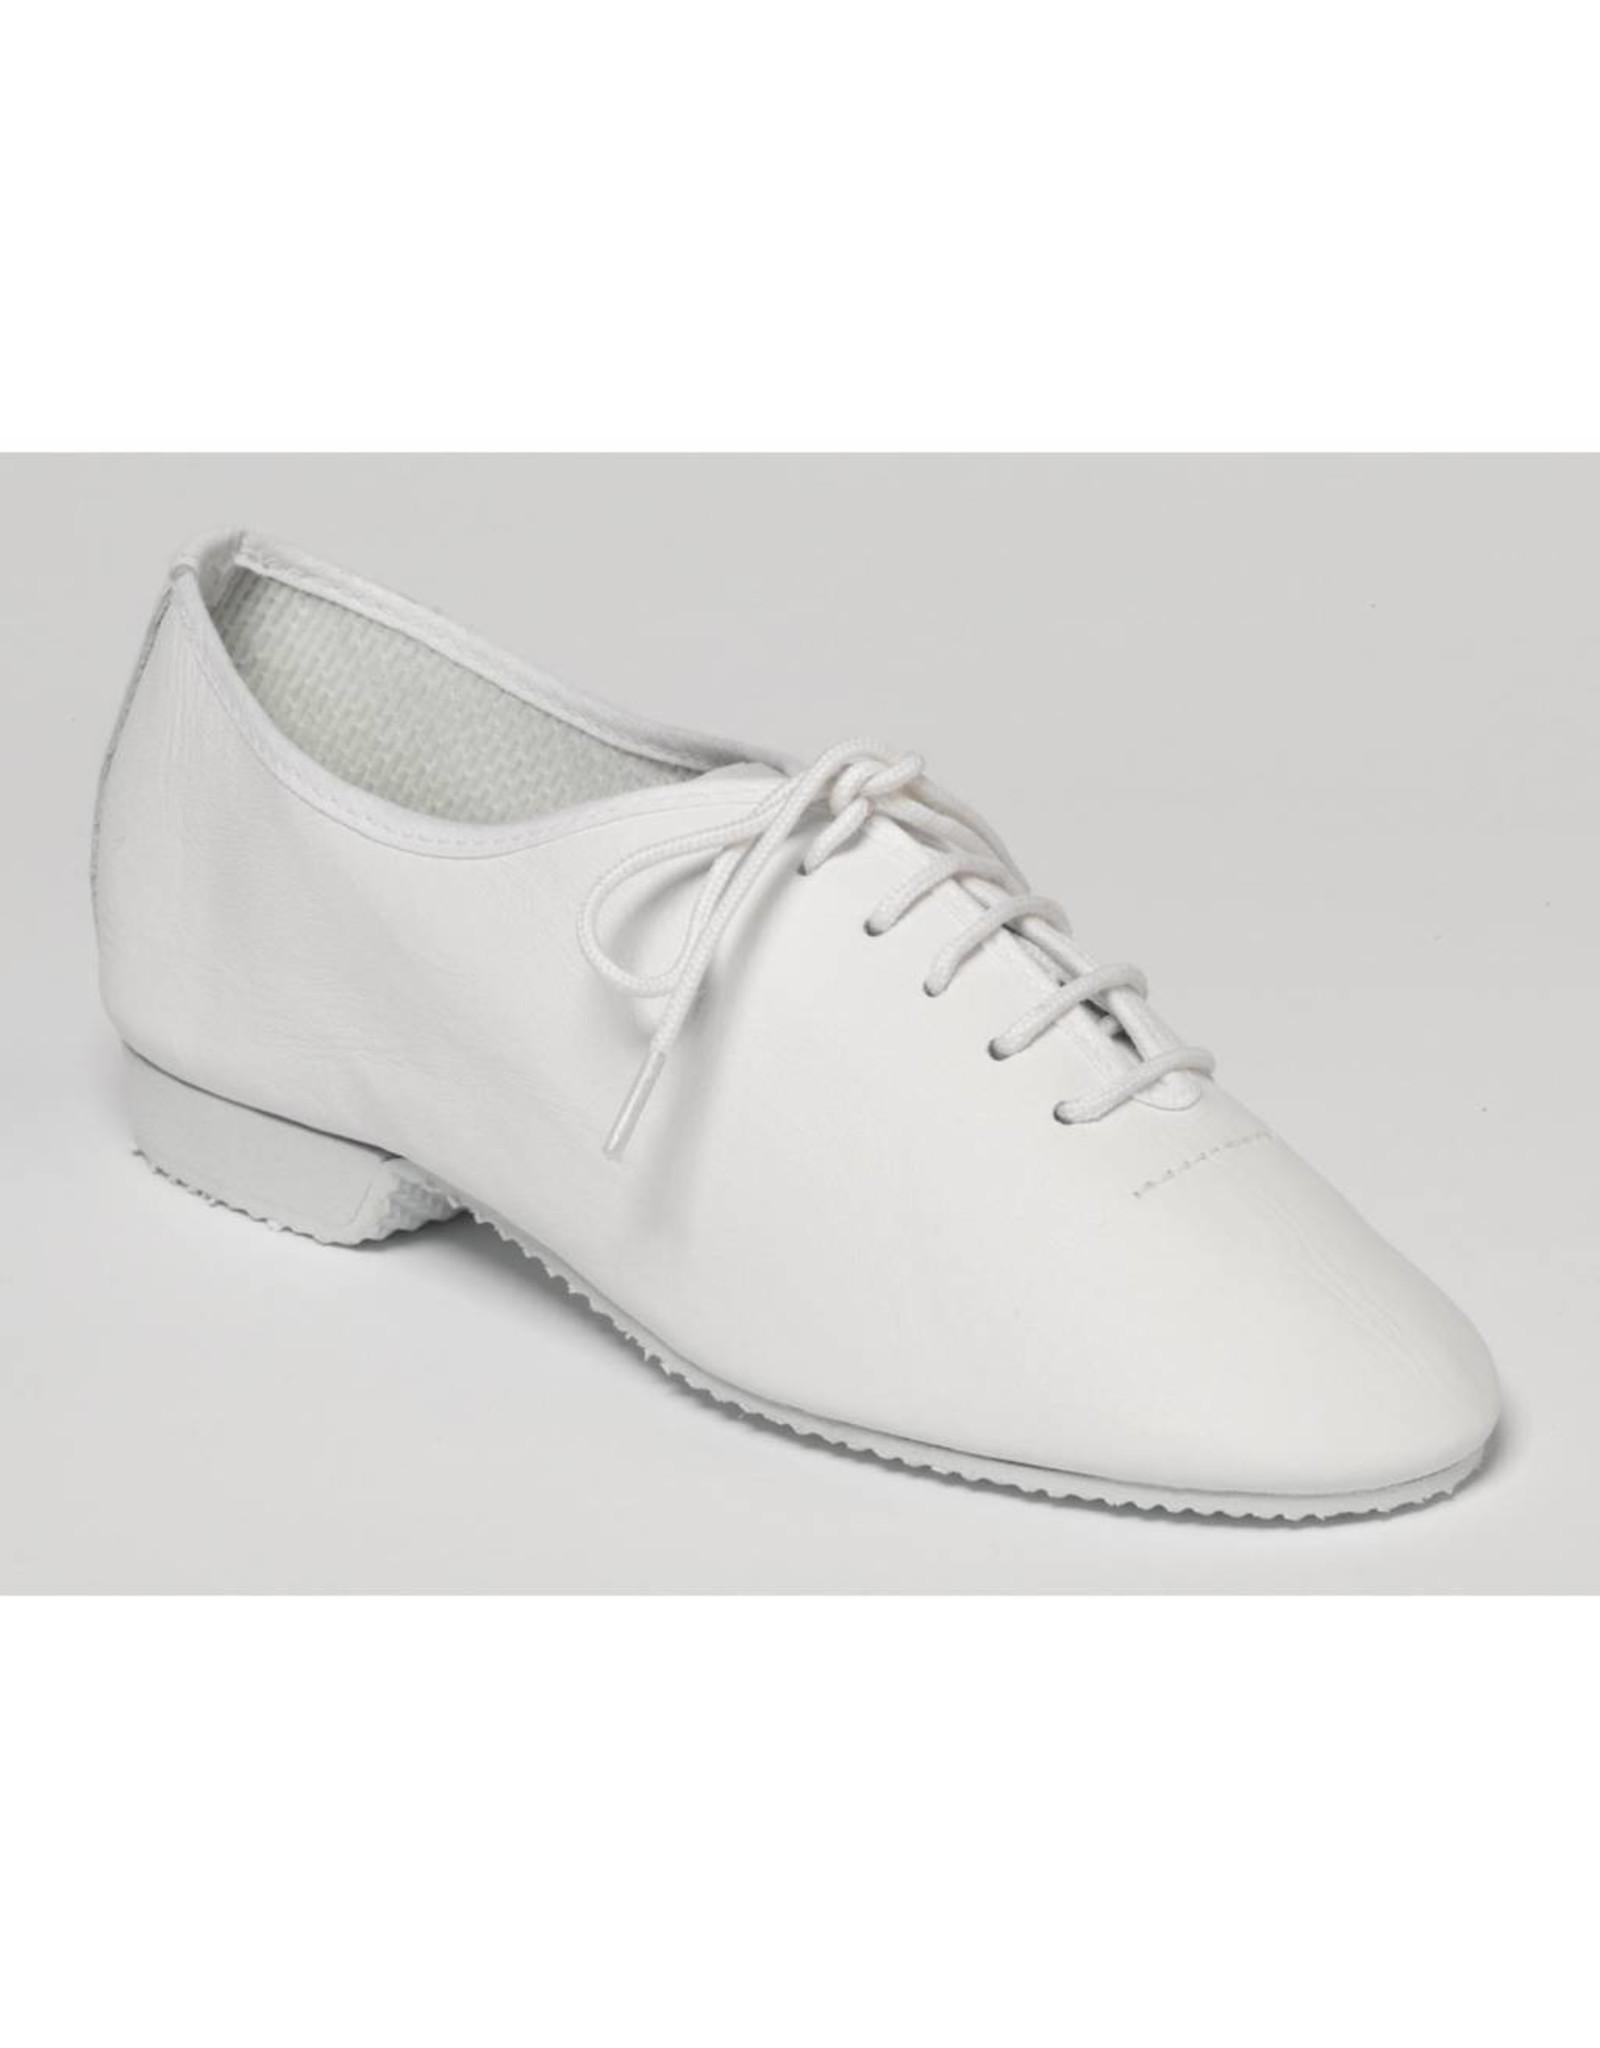 Capezio CG02 Split Sole Jazz Shoe WHITE